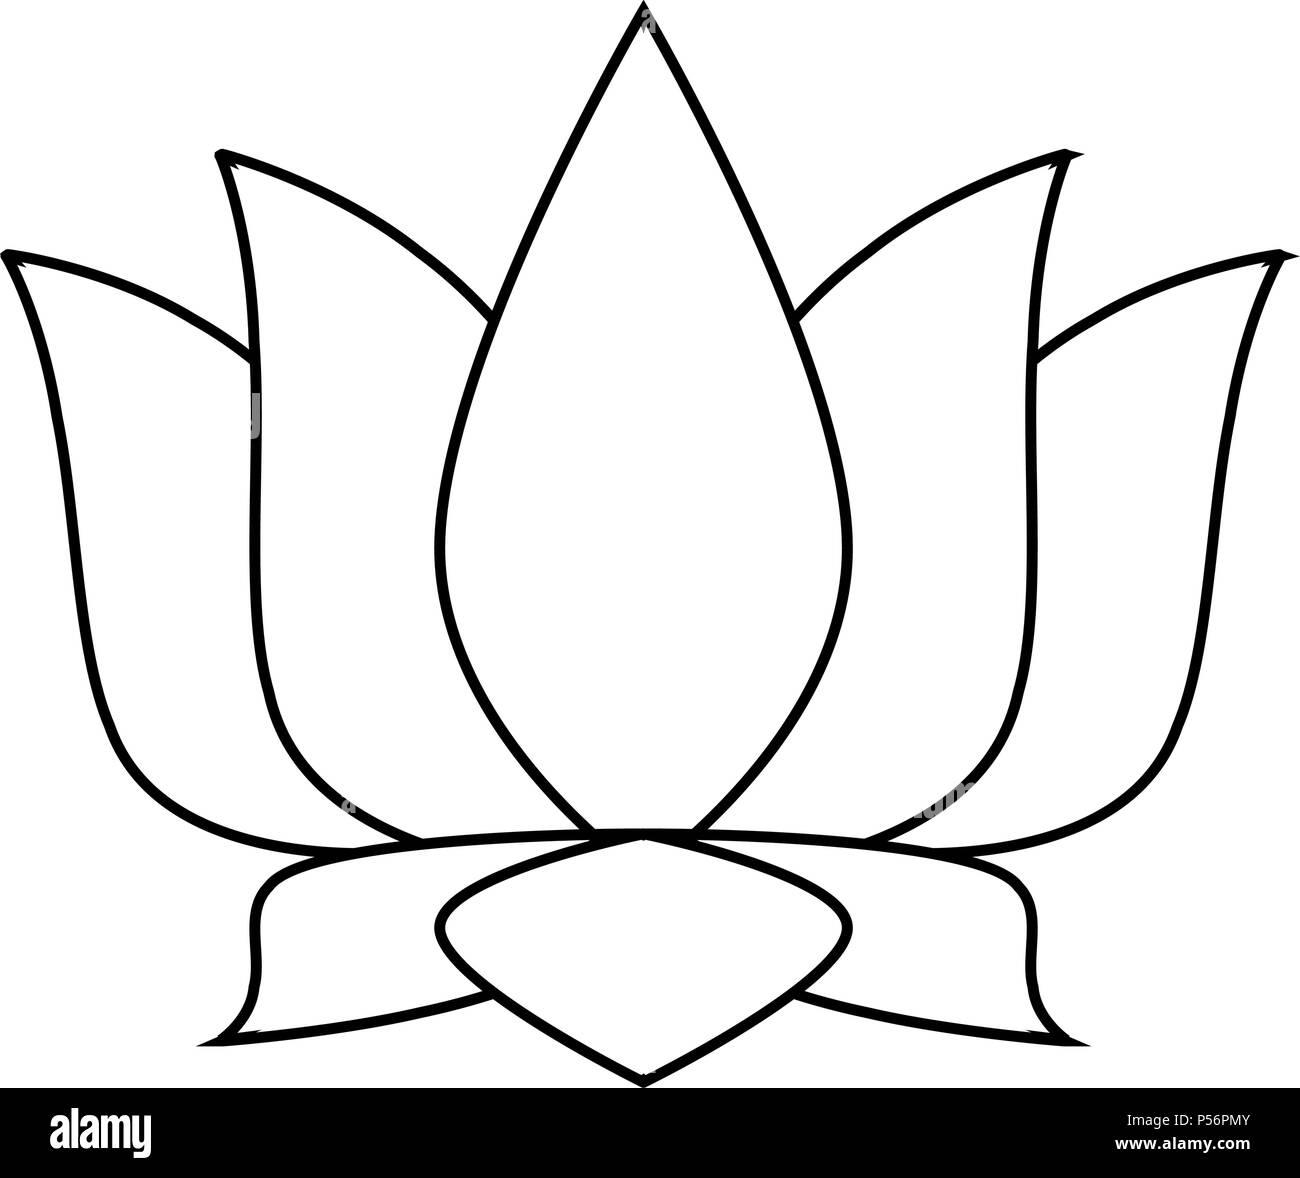 Lotus flower symbol in black and white stock vector art lotus flower symbol in black and white mightylinksfo